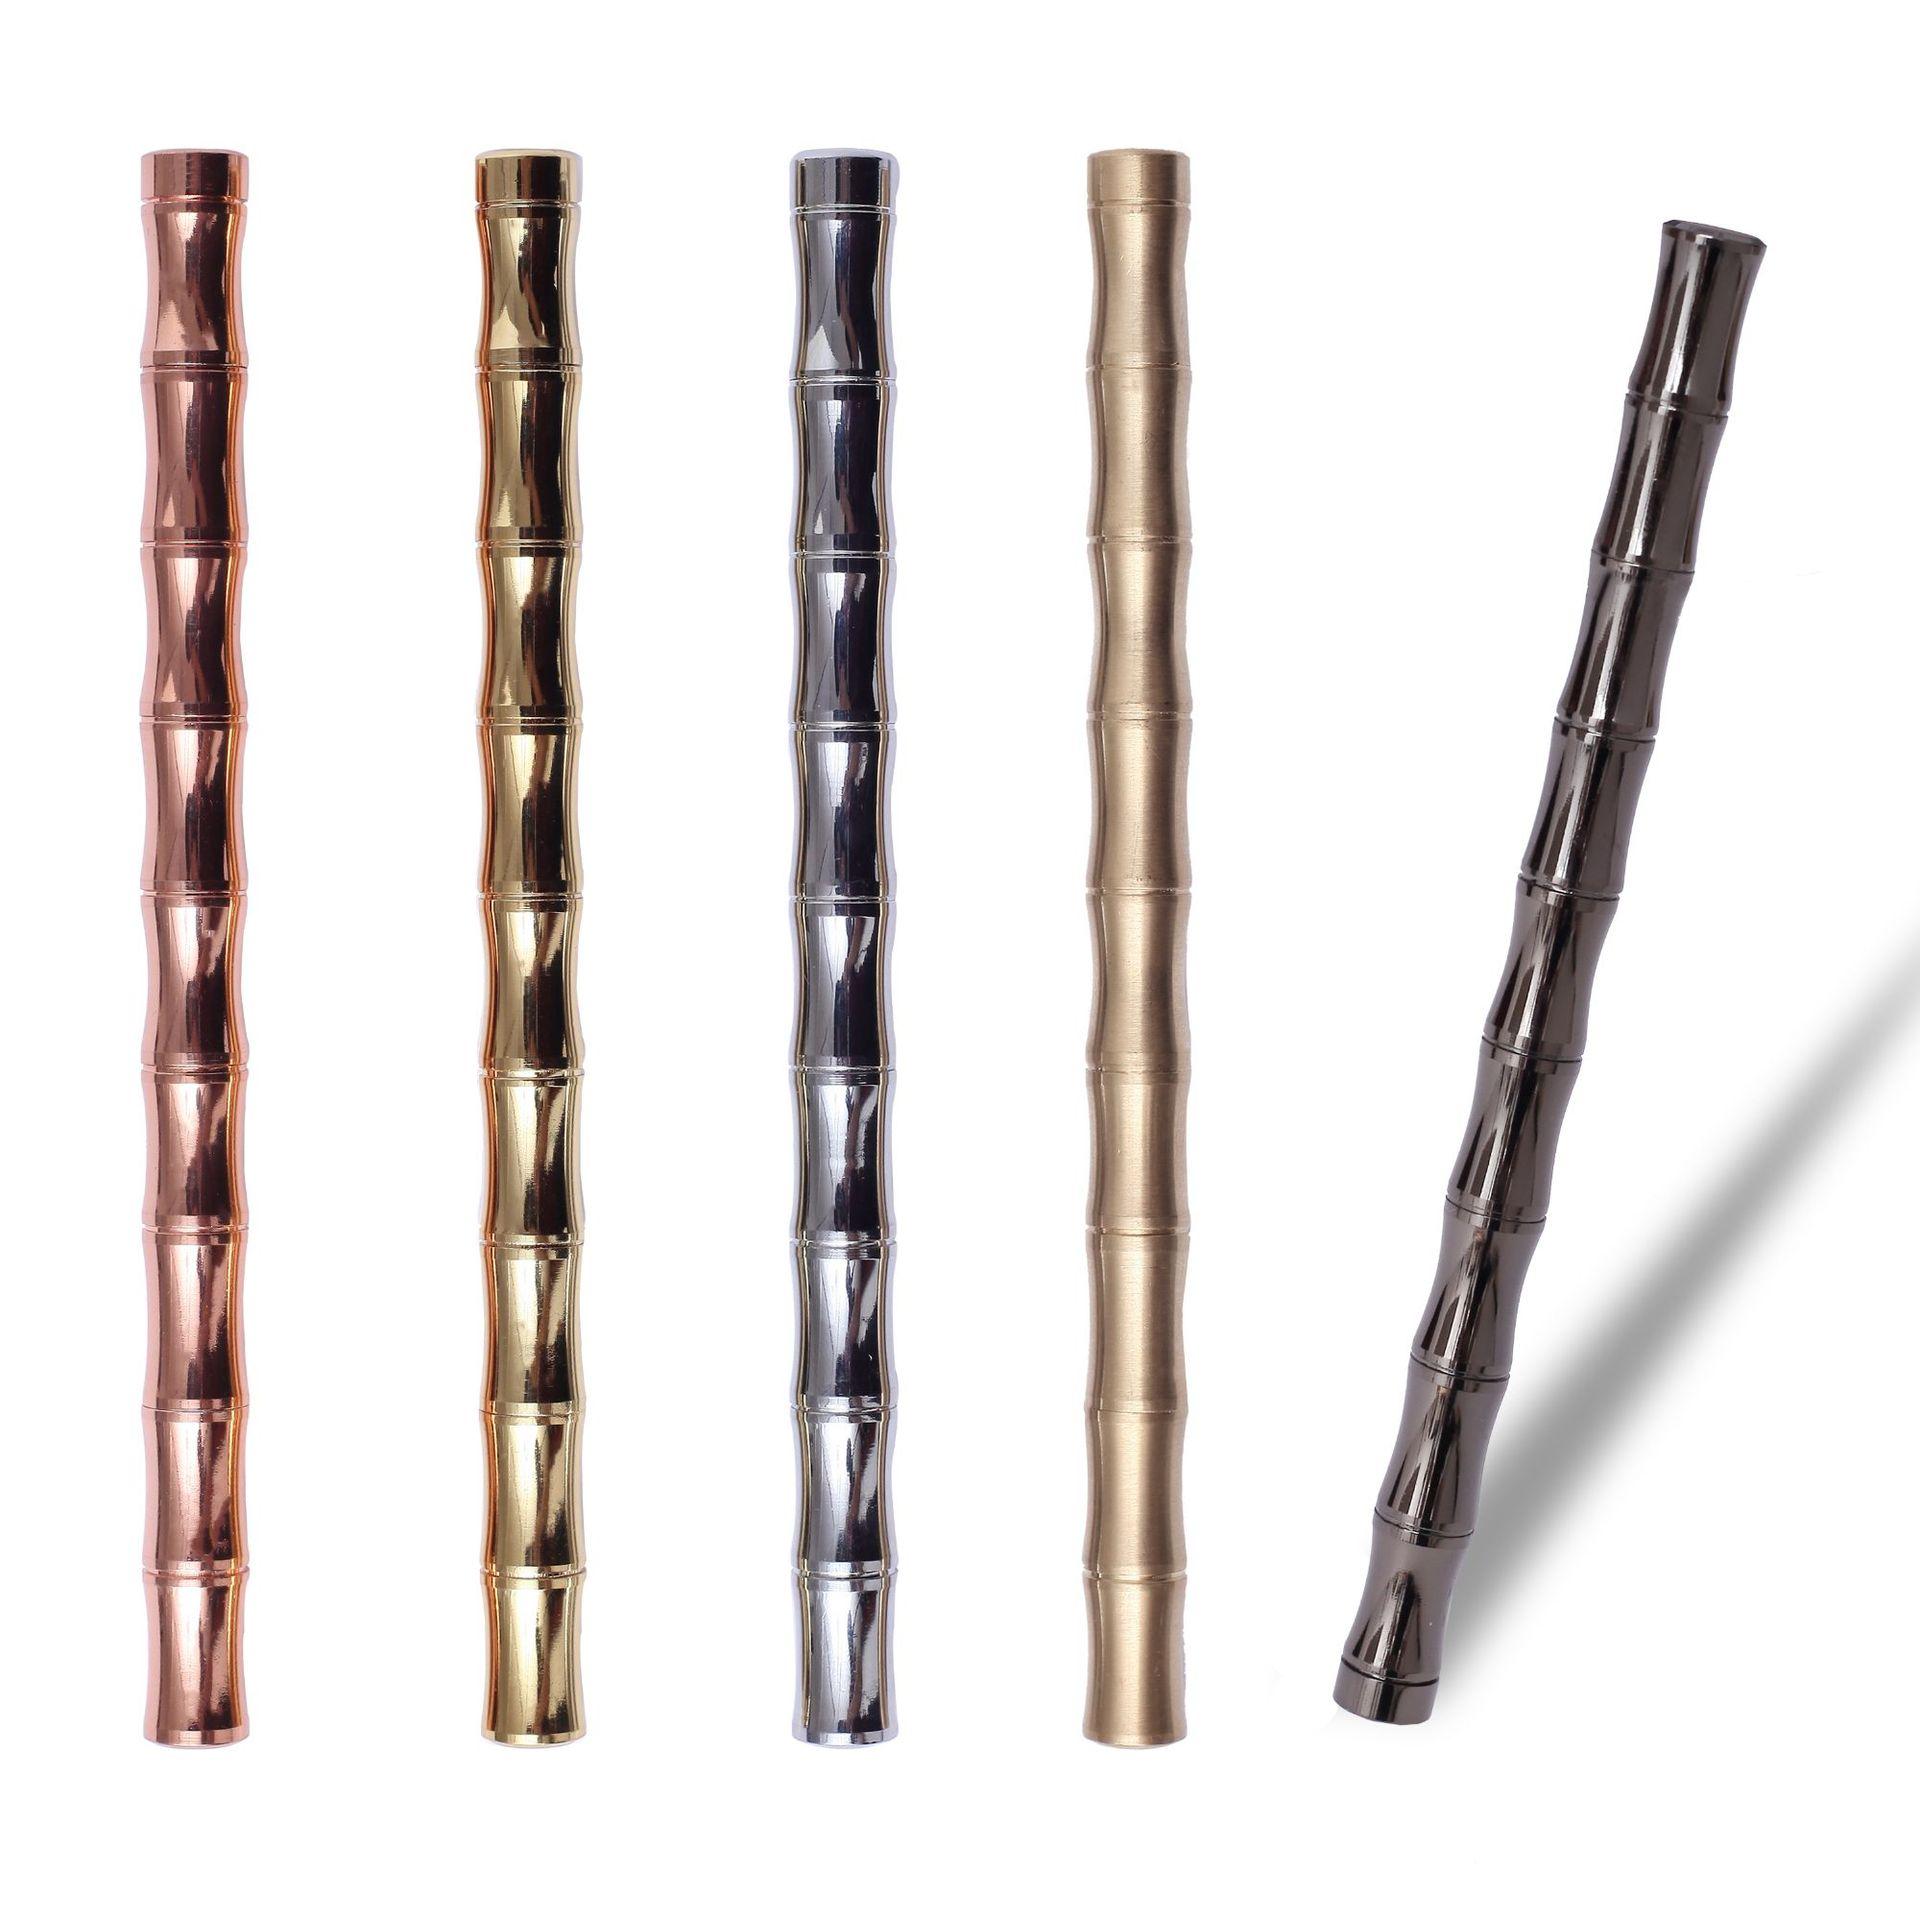 DEXIN Factory brass pen gel pen creative stationery metal signature pen custom gift custom logo adve